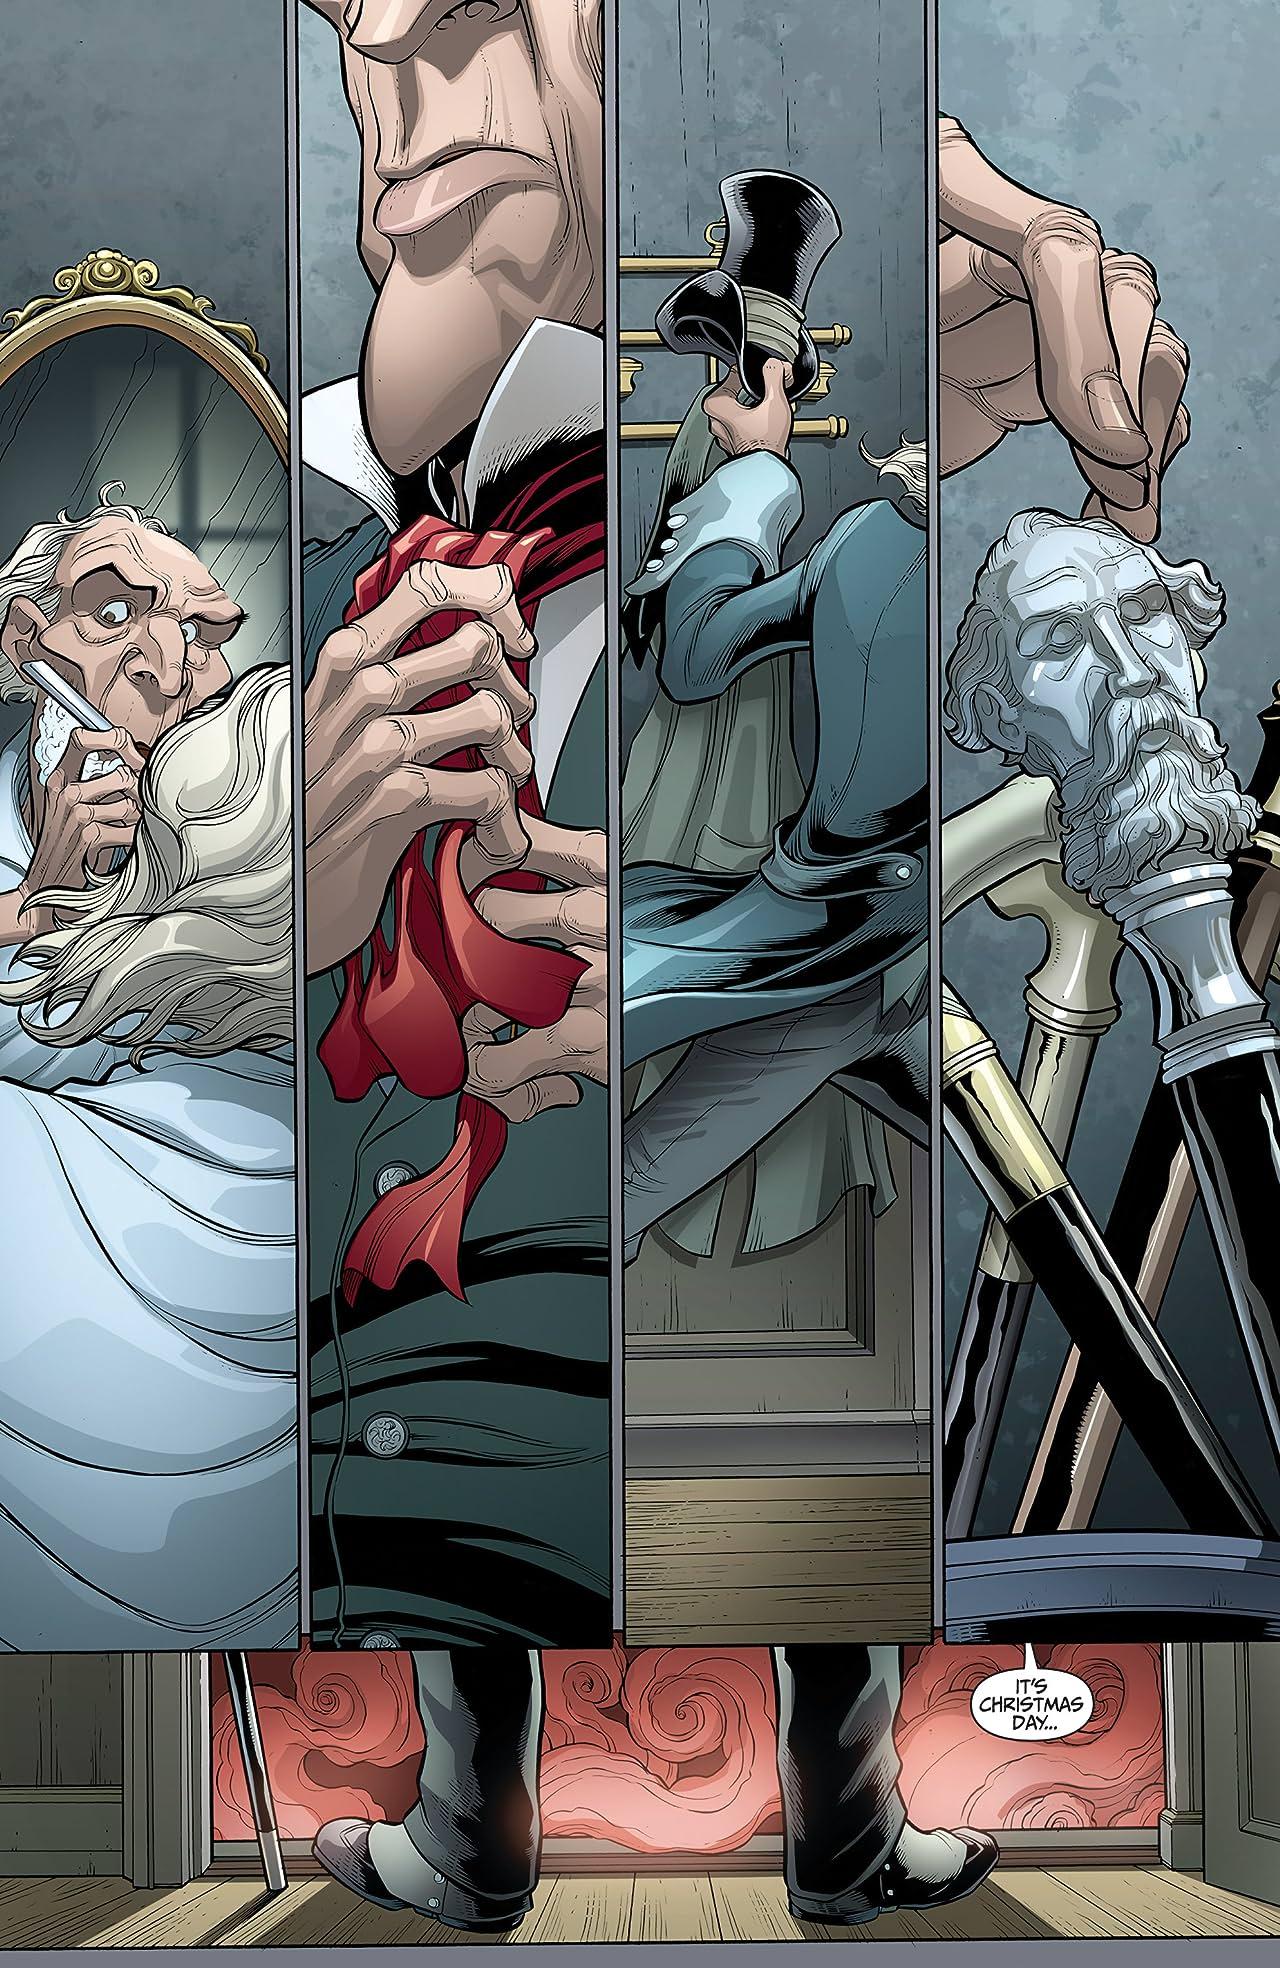 Marvel Zombies Christmas Carol #5 (of 5)